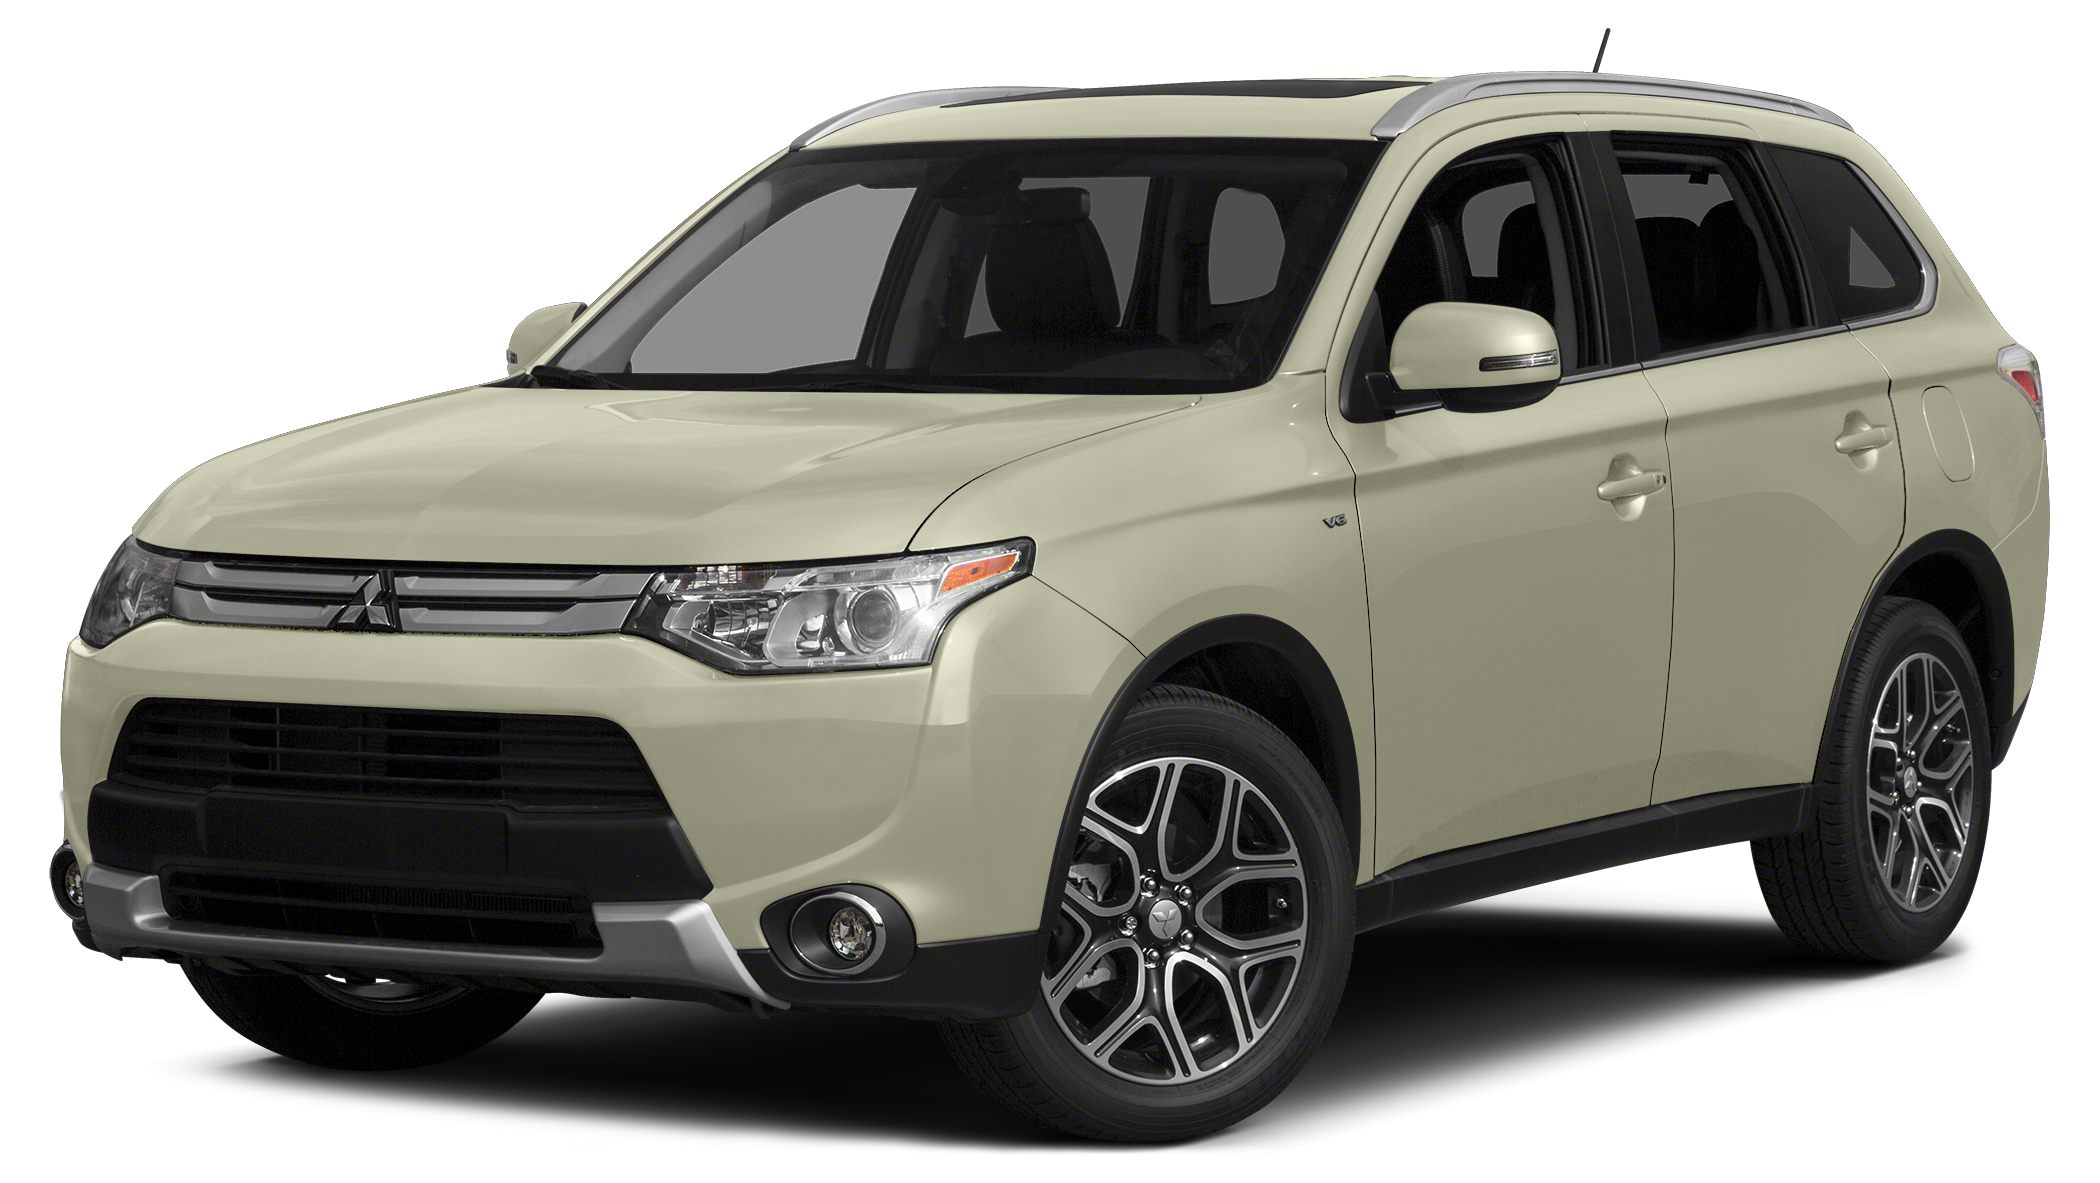 2015 Mitsubishi Outlander ES Mp3 and traction control will make driving this 2015 Mitsubishi Outlan